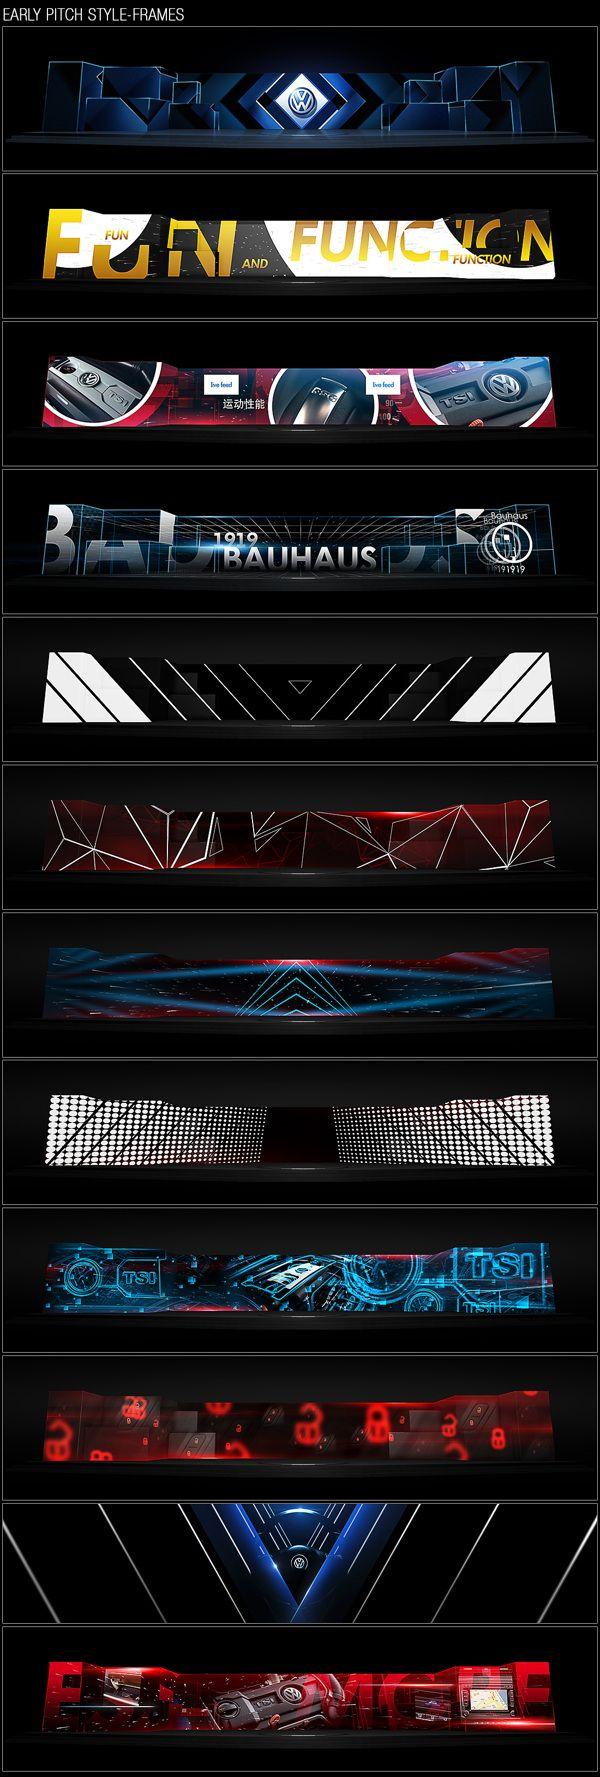 VW Sagitar Car Launch 2012 by Kaism Lim, via Behance